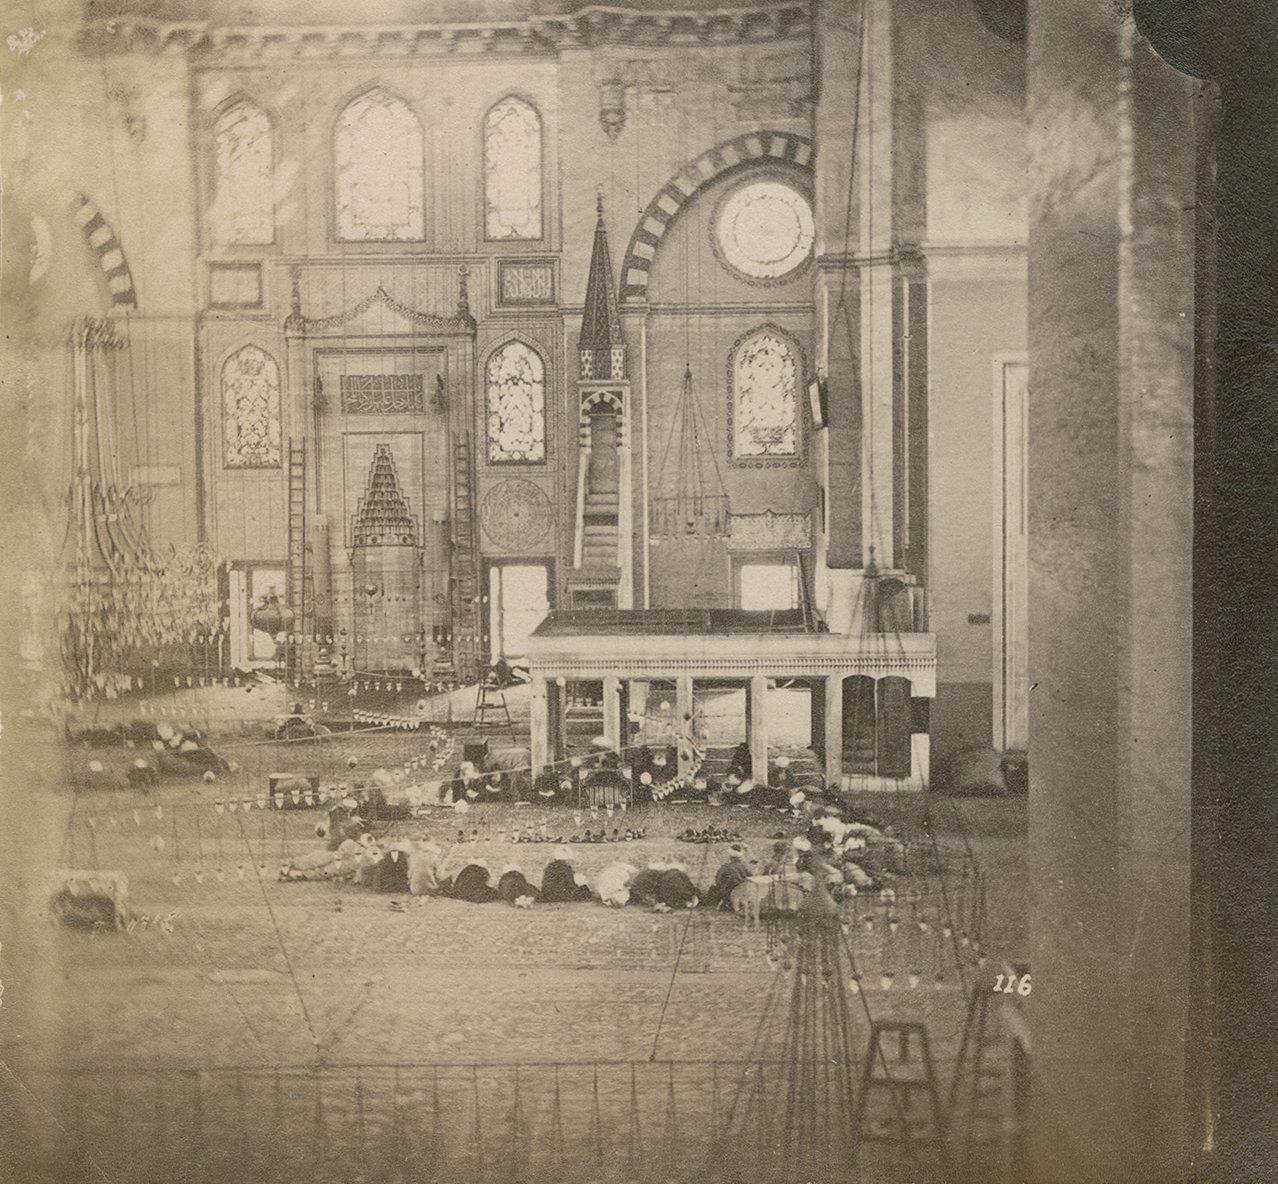 People praying in Hagia Sophia, Istanbul